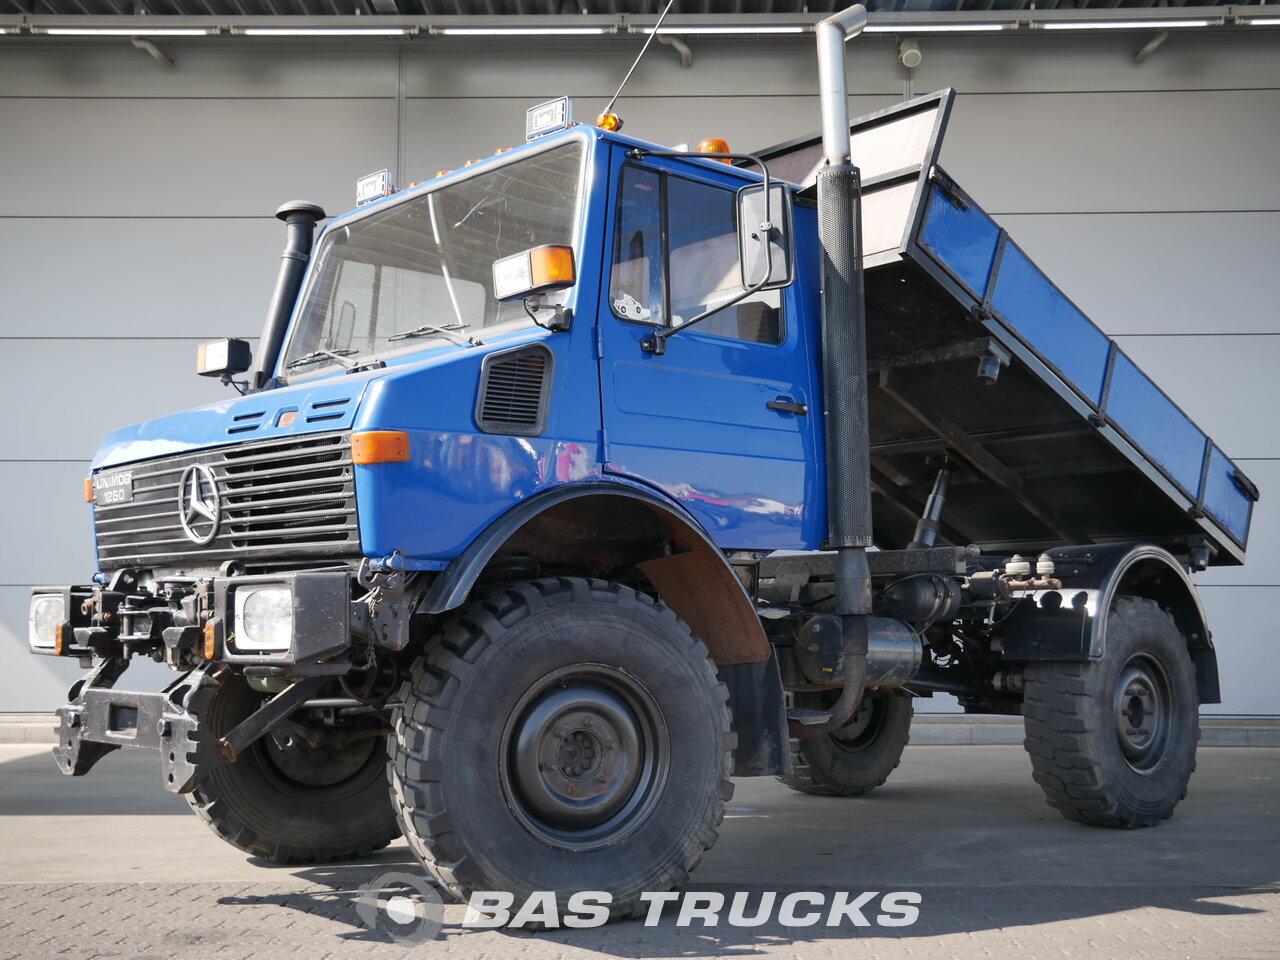 Mercedes Unimog U1250 1986 Camion Benne Bas Trucks